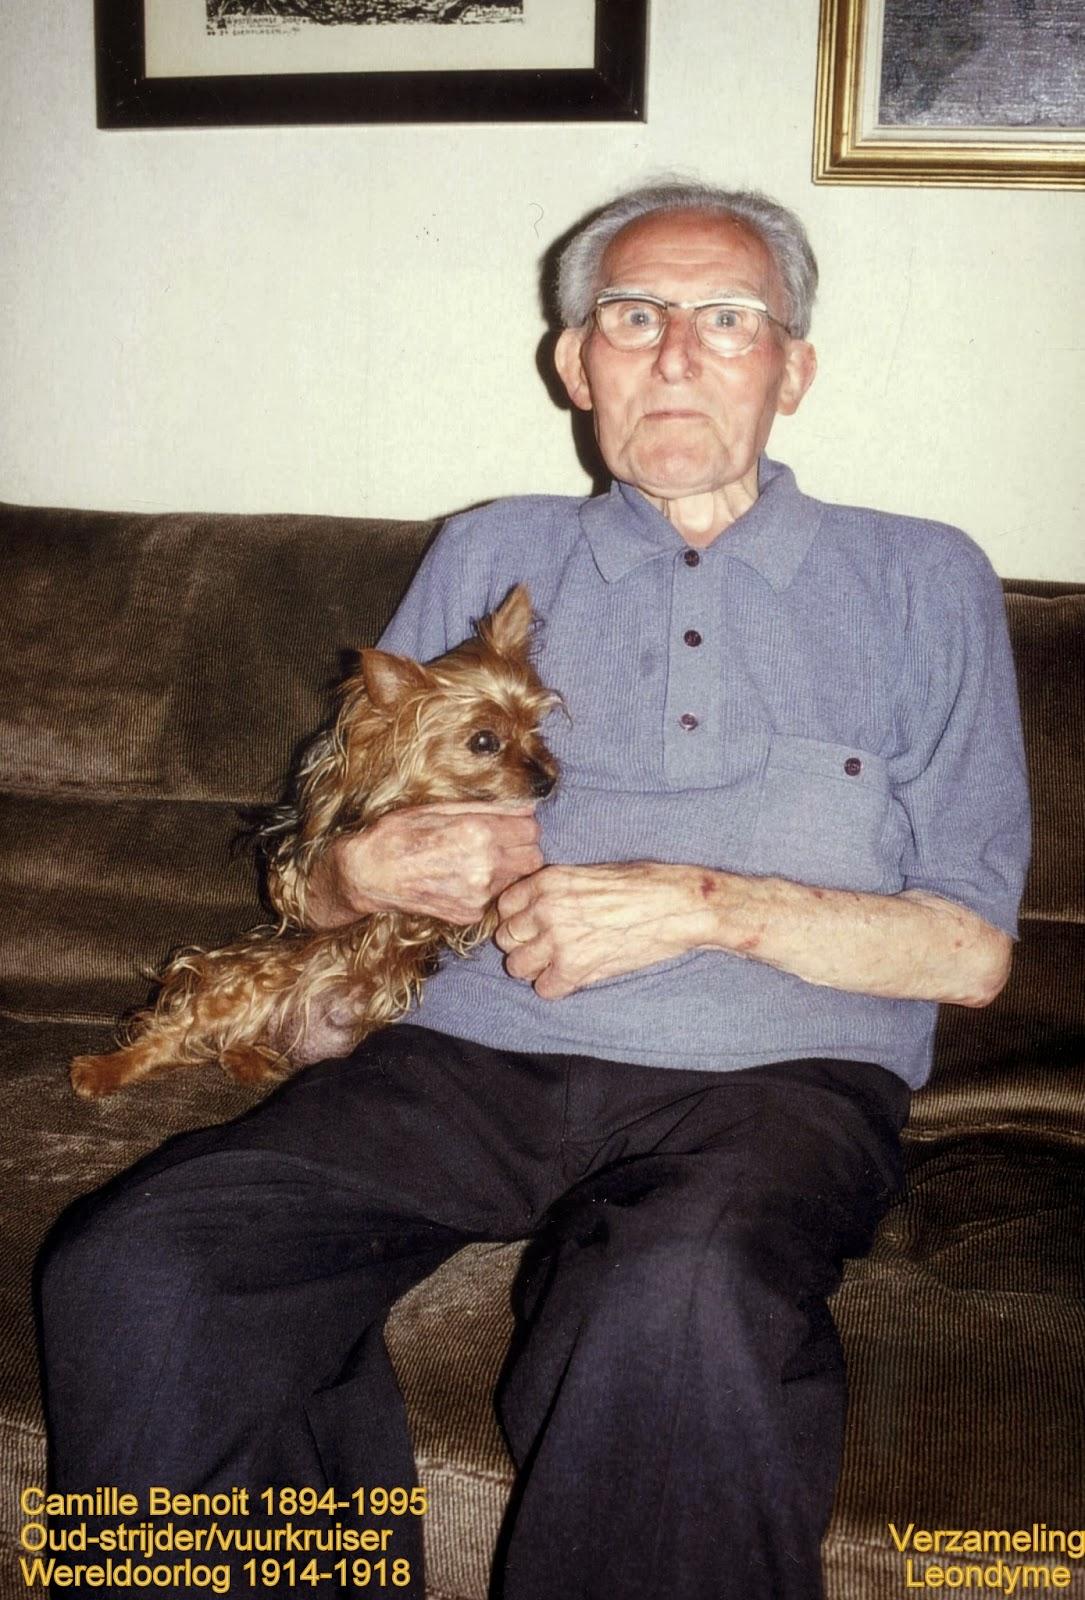 Oud-strijder/vuurkruiser Camille Benoit op 100-jarige leeftijd. Verzameling Leondyme